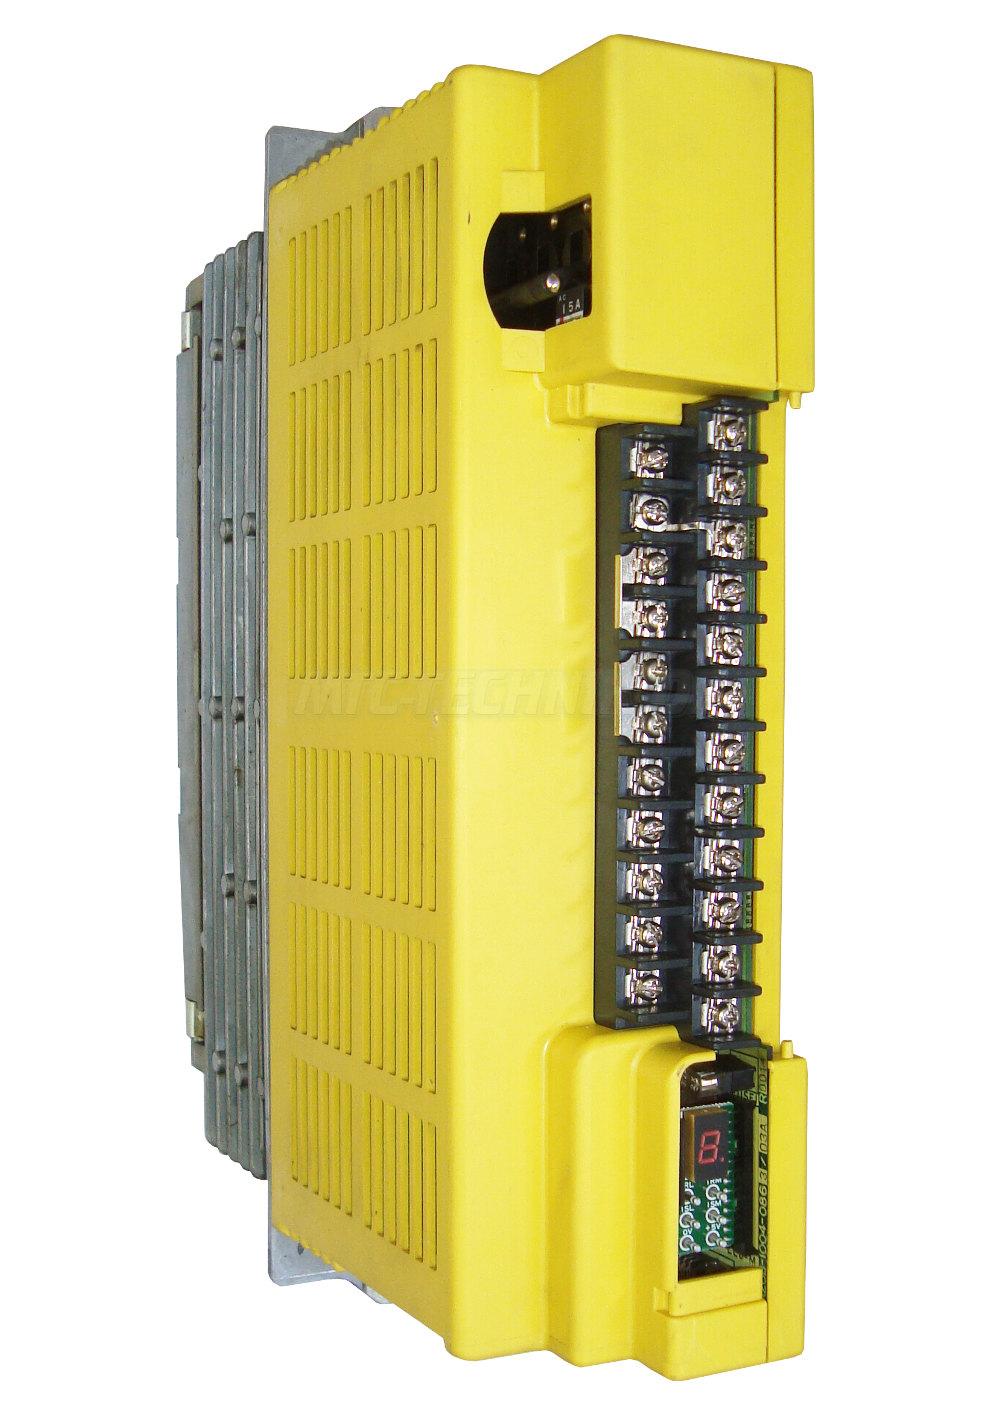 1 Fanuc Regler A06b-6066-h233 Online Shop